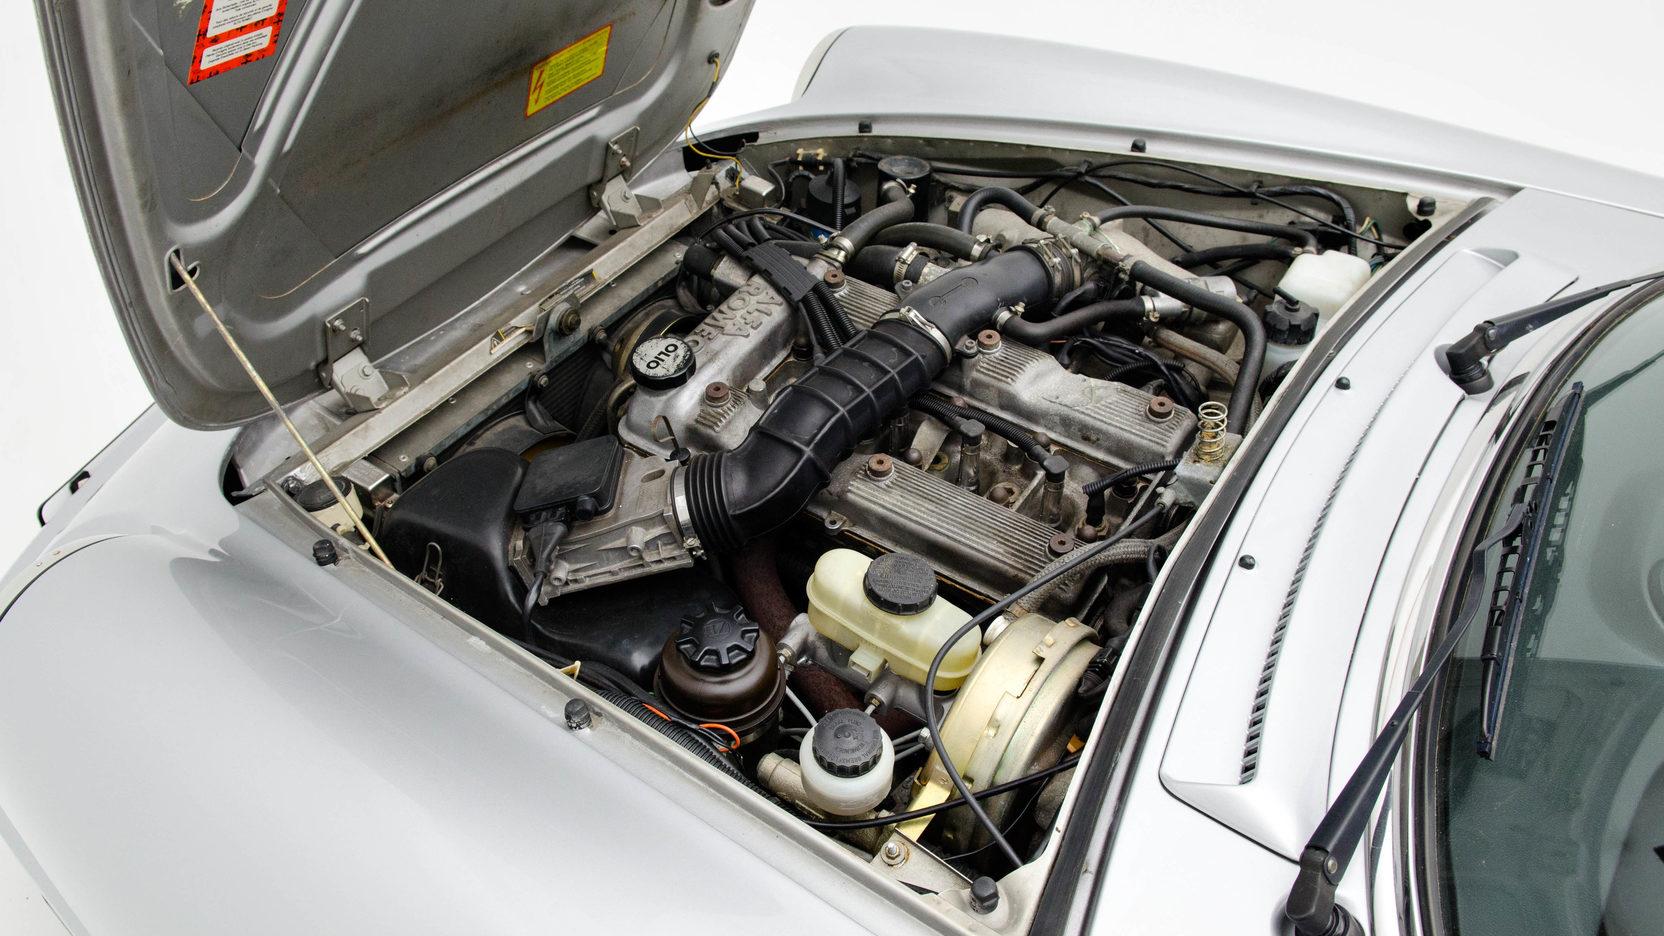 1991 Alfa Romeo Spider engine